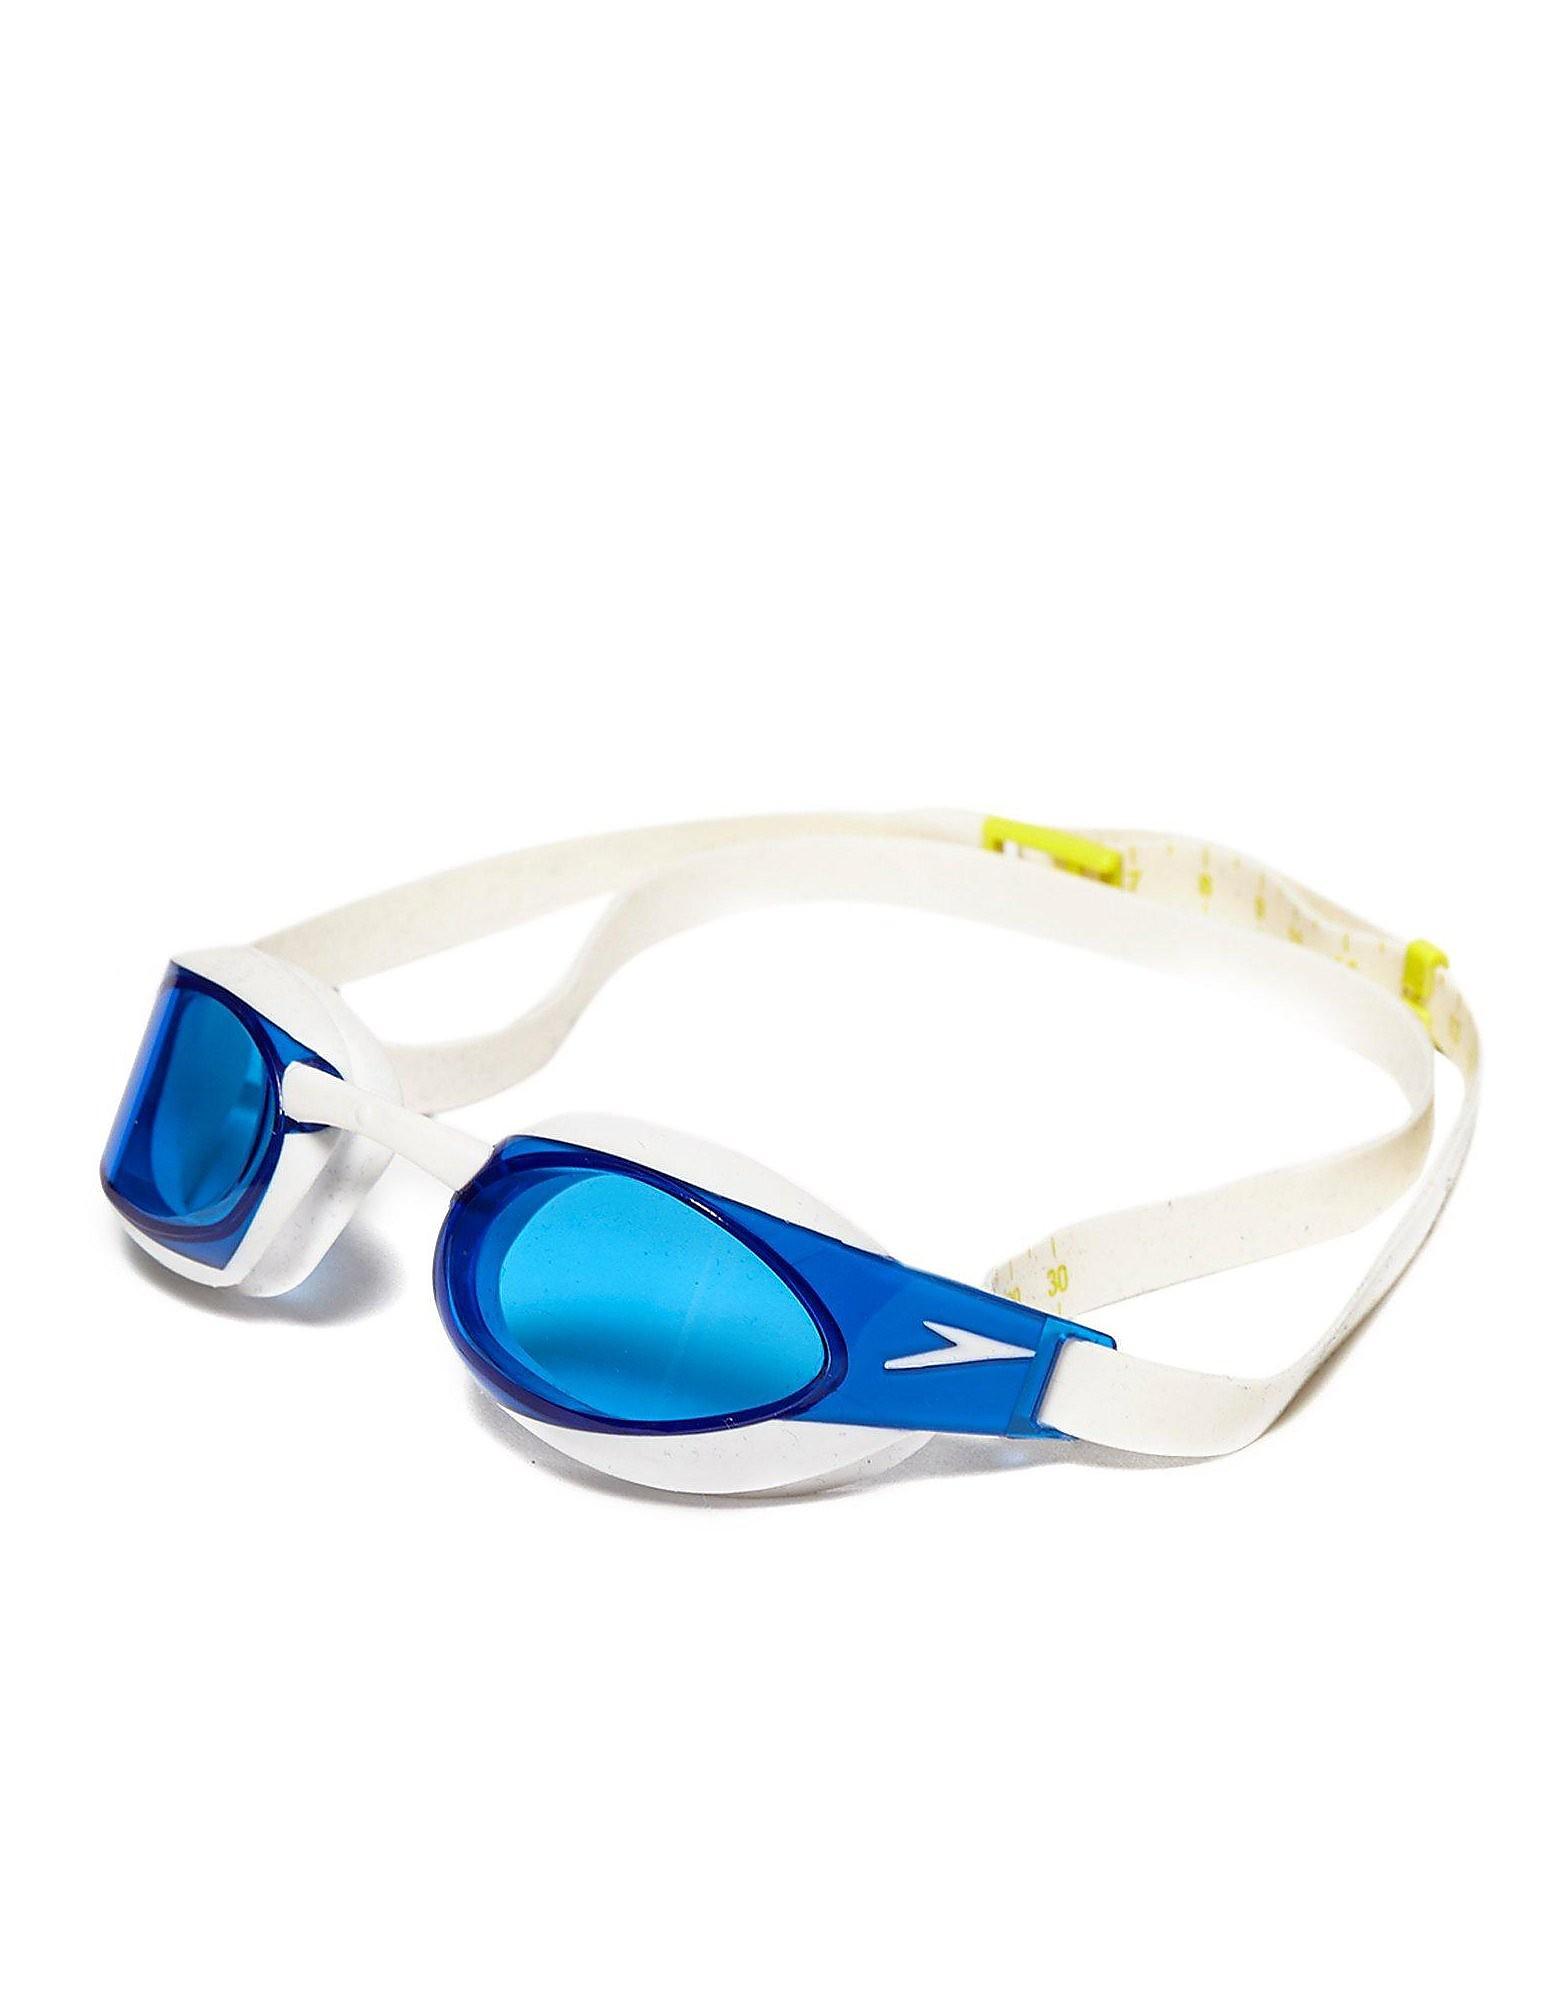 Speedo Fastskin3 Elite Goggles